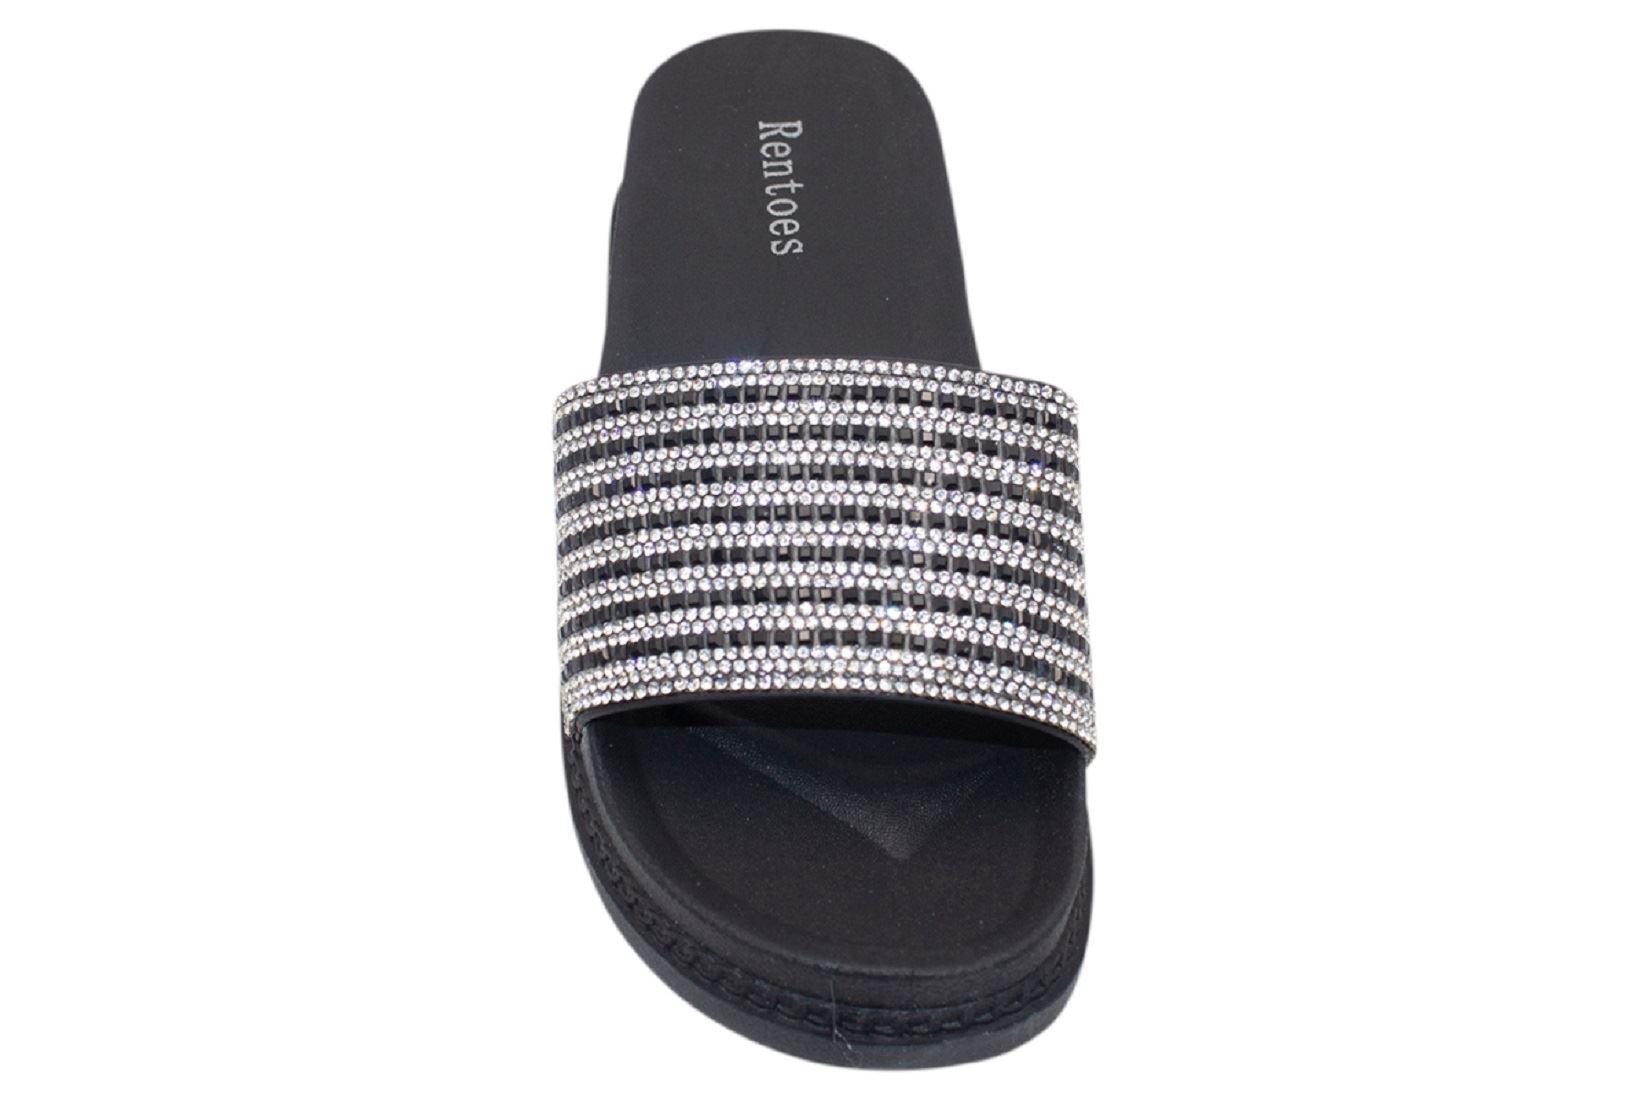 Womens-Sliders-Casual-Slippers-Mules-Ladies-Diamante-Flip-Flop-Sandals-Shoes thumbnail 32